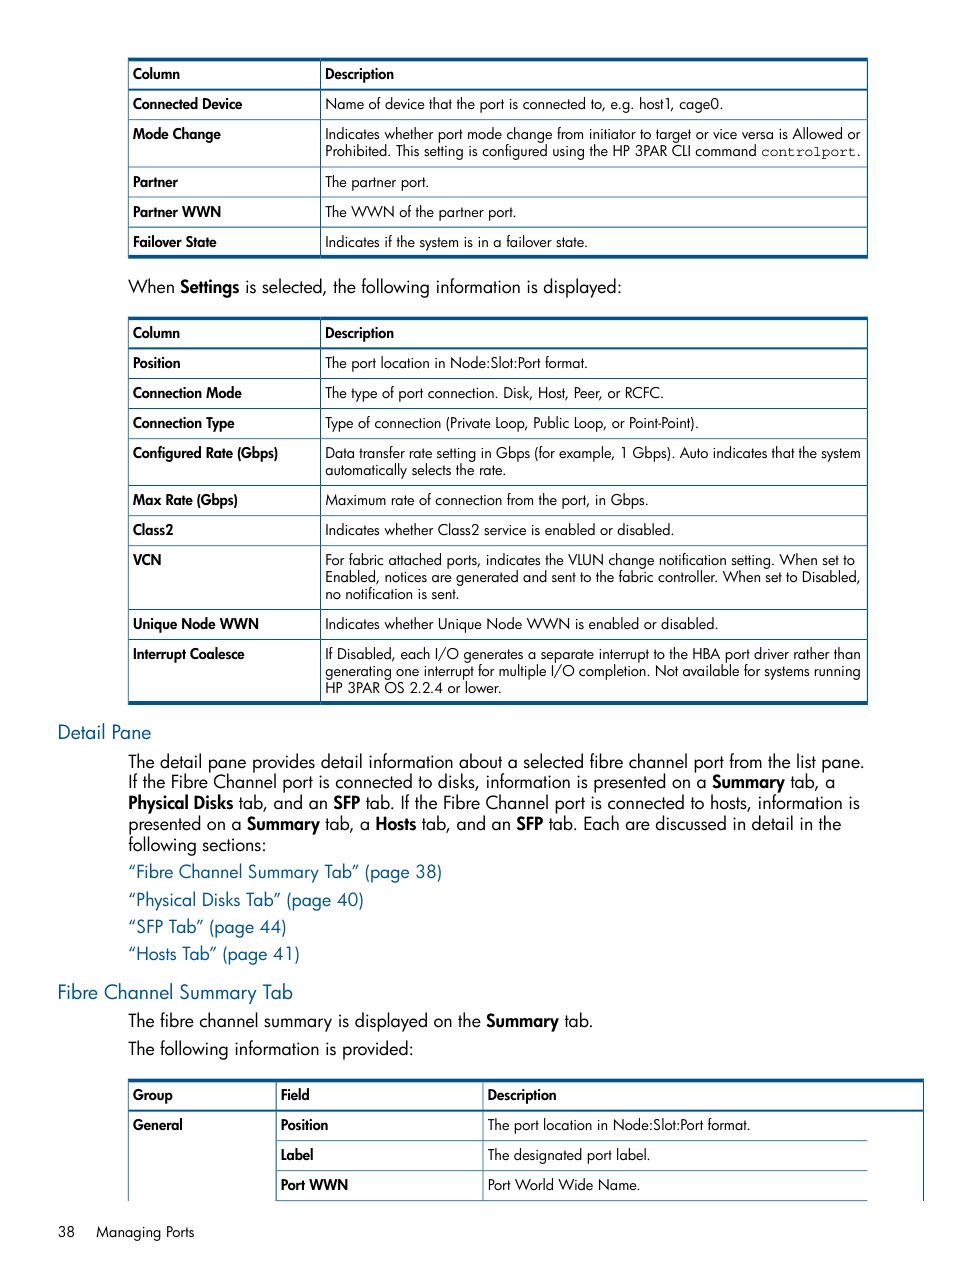 Detail pane, Fibre channel summary tab, Detail pane fibre